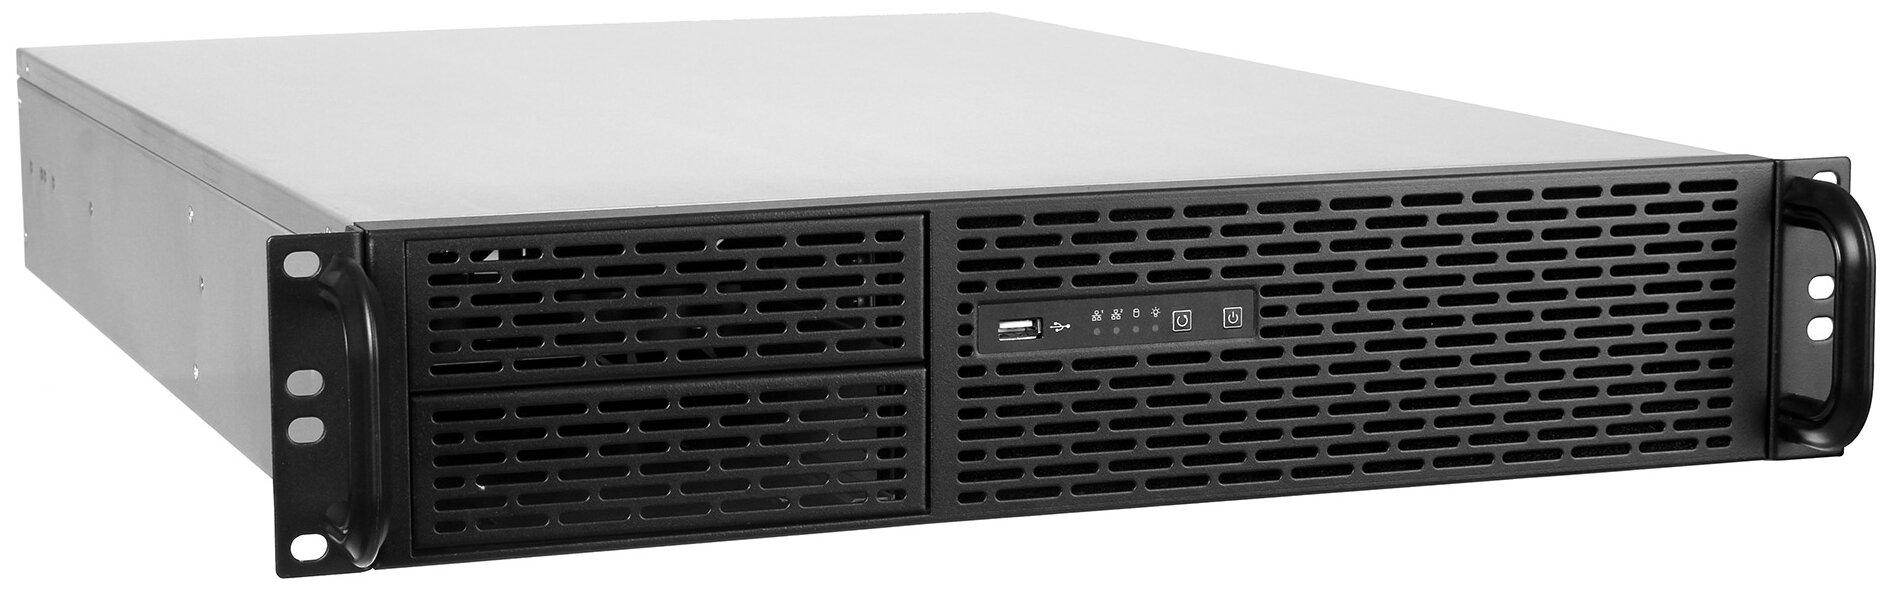 Корпус для сервера 2U ExeGate 2U650-06/2U2098L (EX172964RUS)